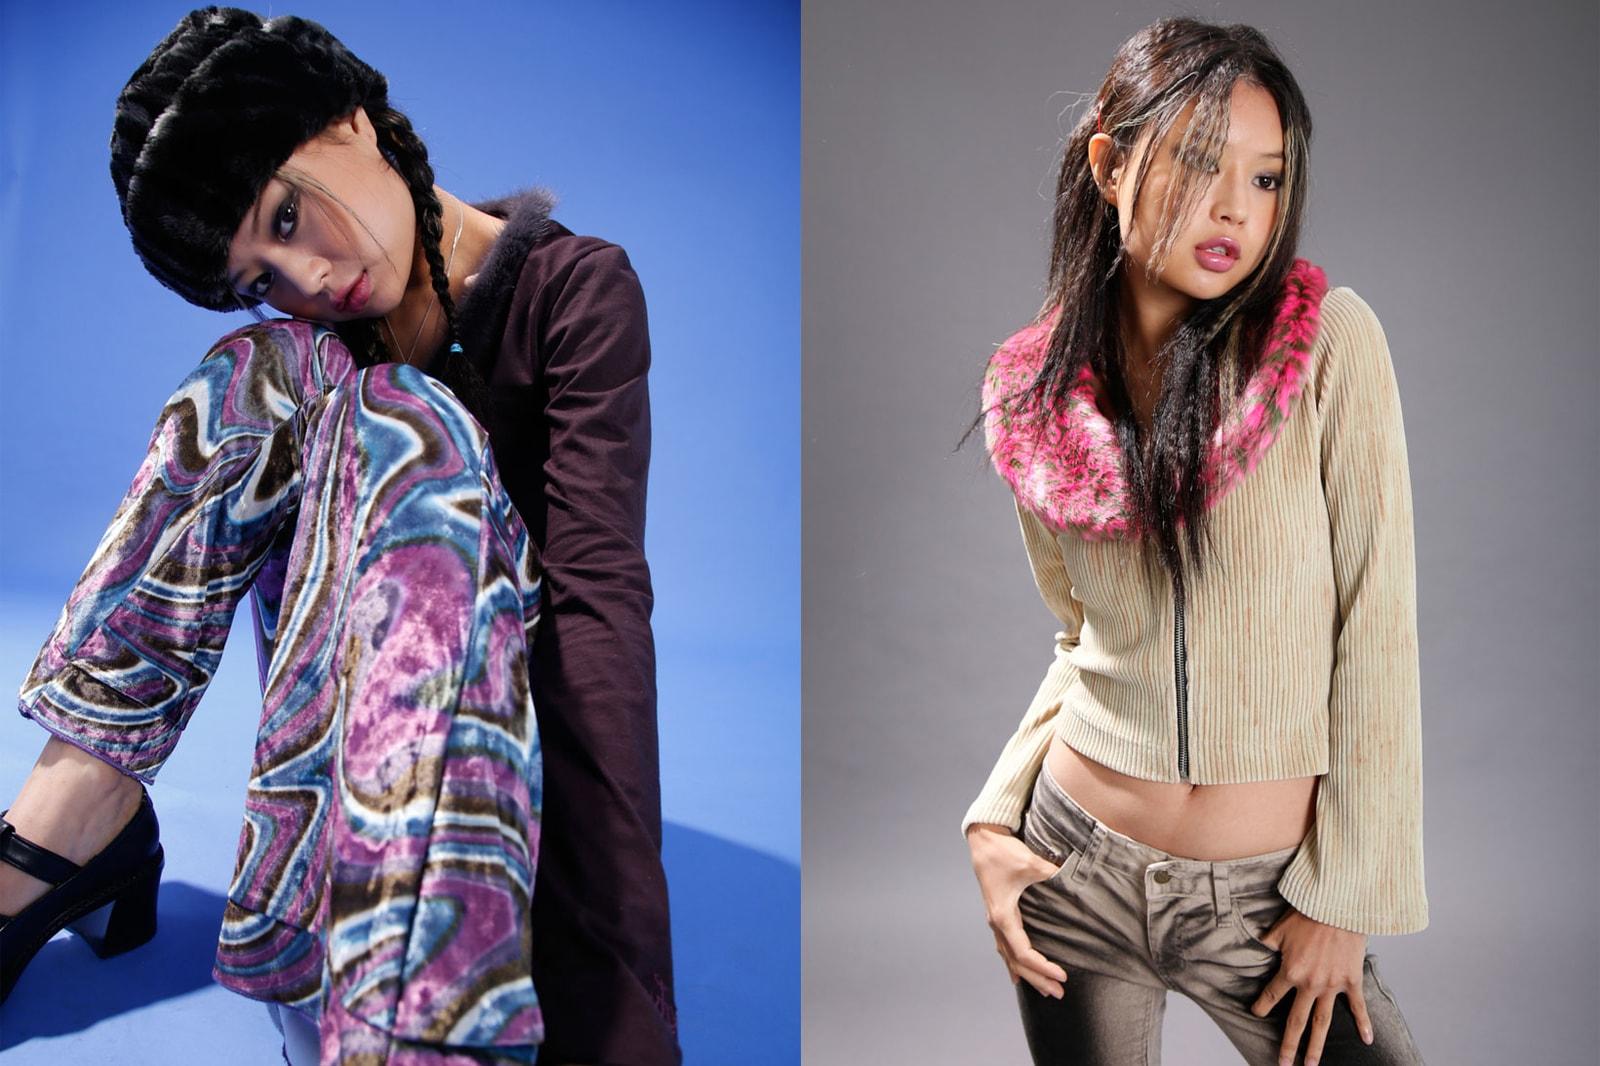 korean fashion emerging female fashion designers brands why not us seo jisoo fur cardigan pattern pants